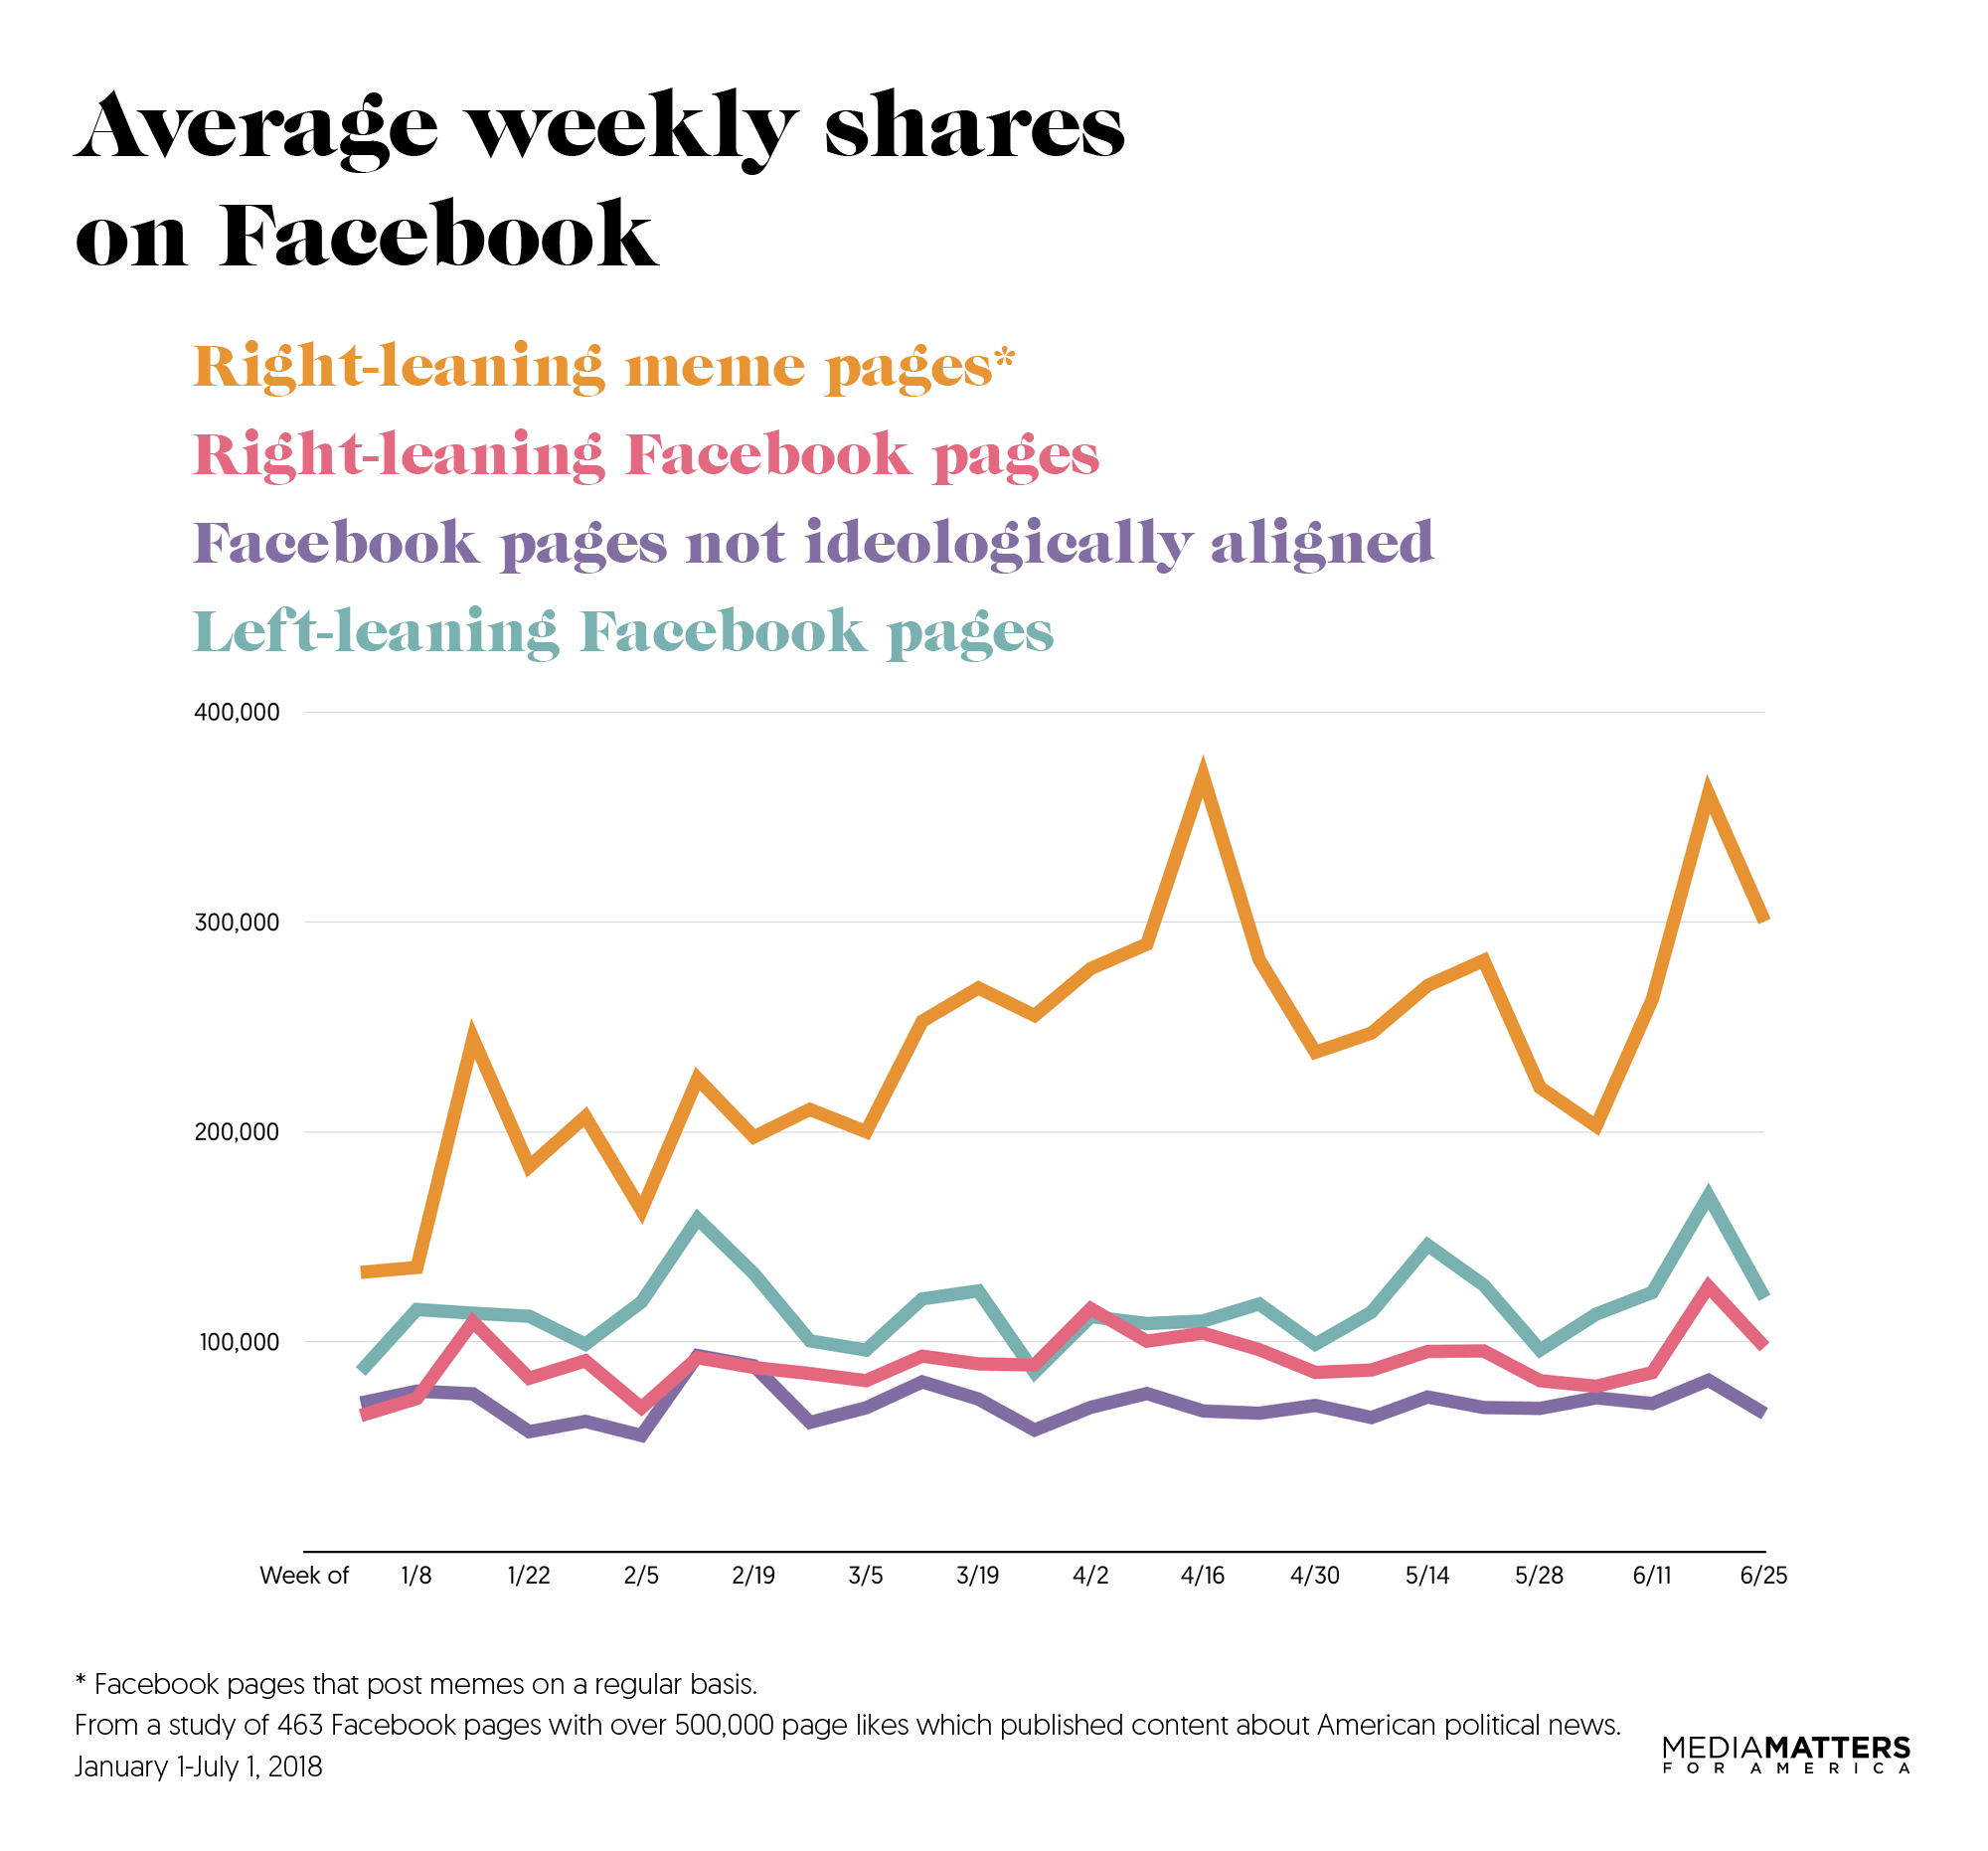 facebookweelyshares-mediamatters-graph3